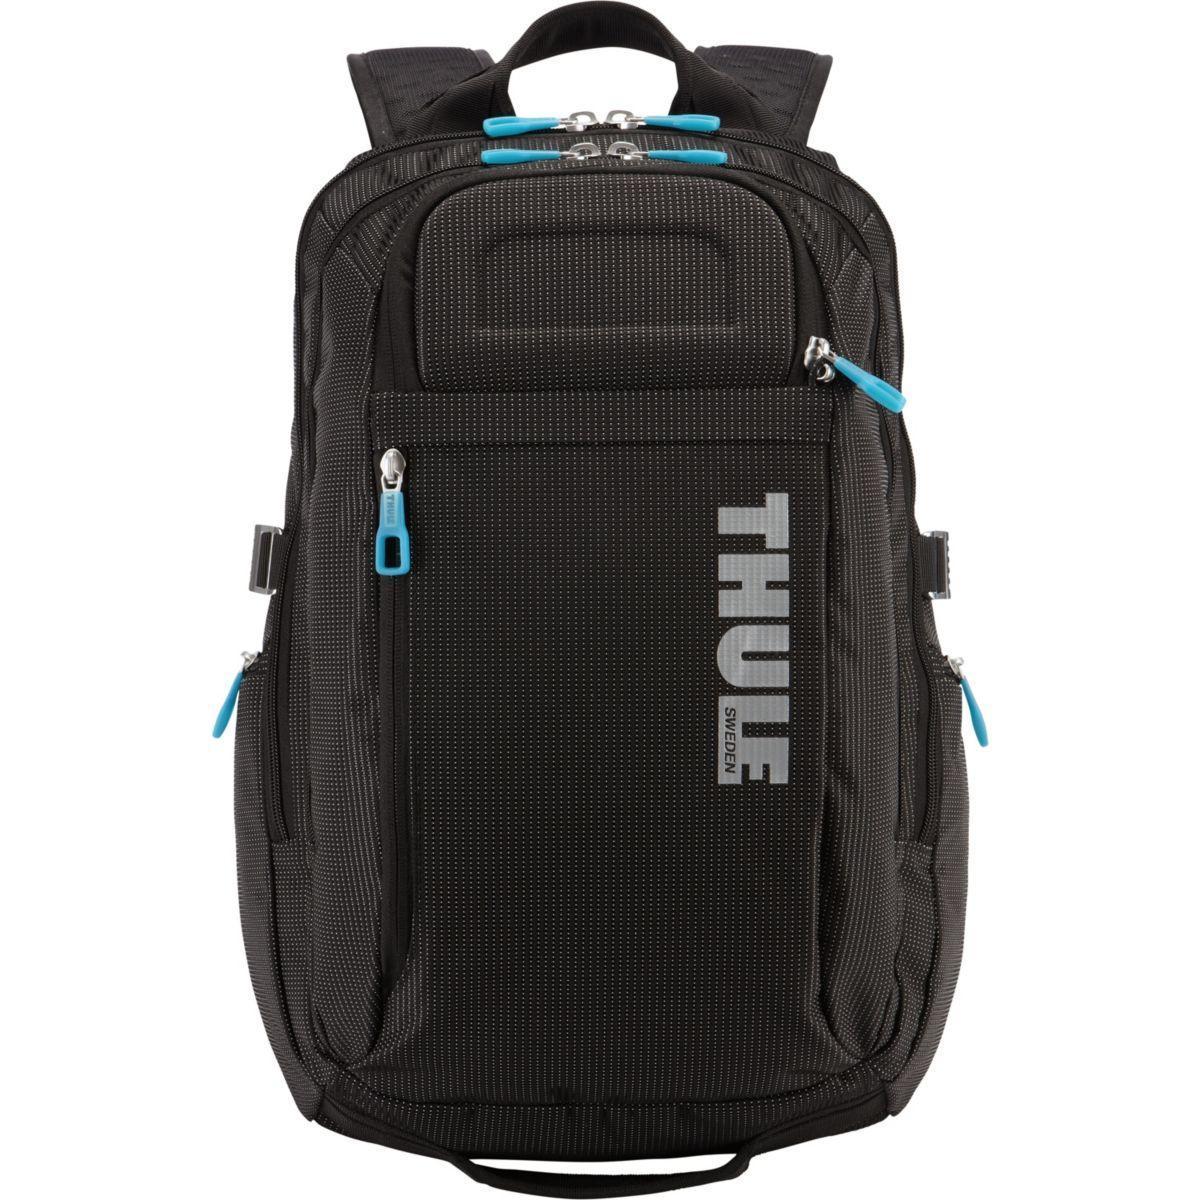 Sac � dos thule crossover backpack 15'' (21 litres) - livraison offerte : code premium